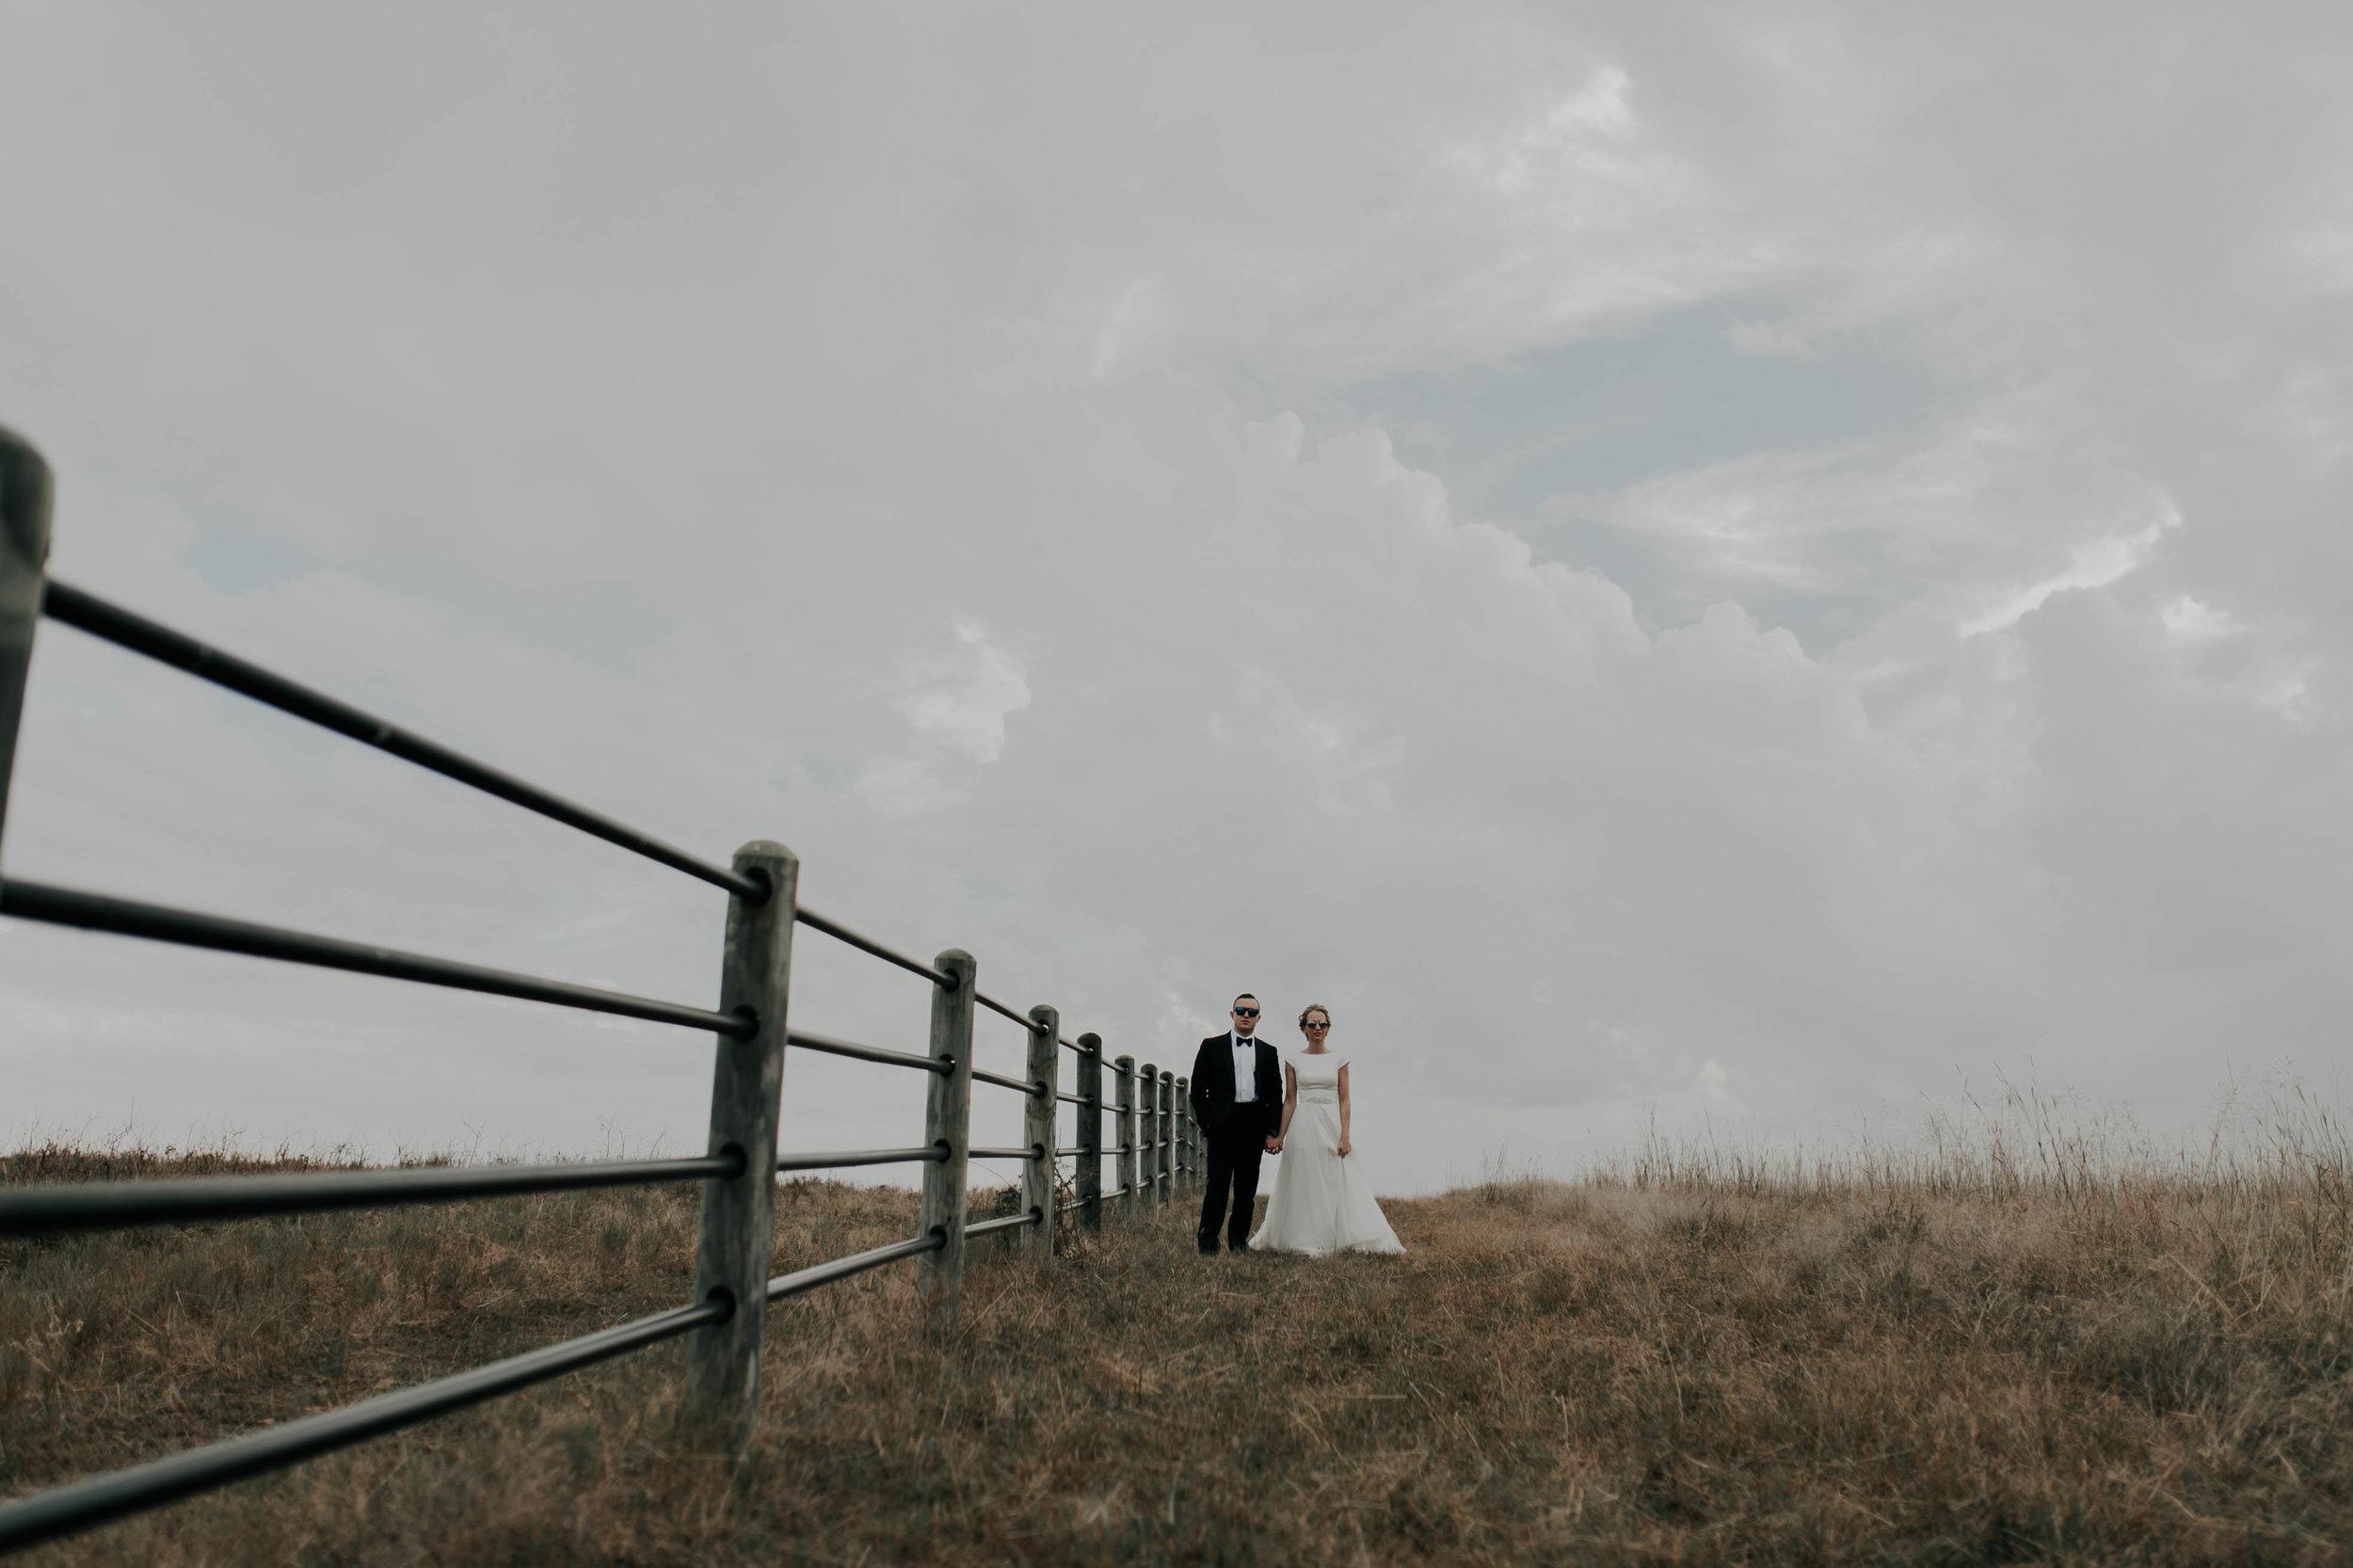 10.06.18ClayEmilyWedding-BrideGroom-1707.jpg